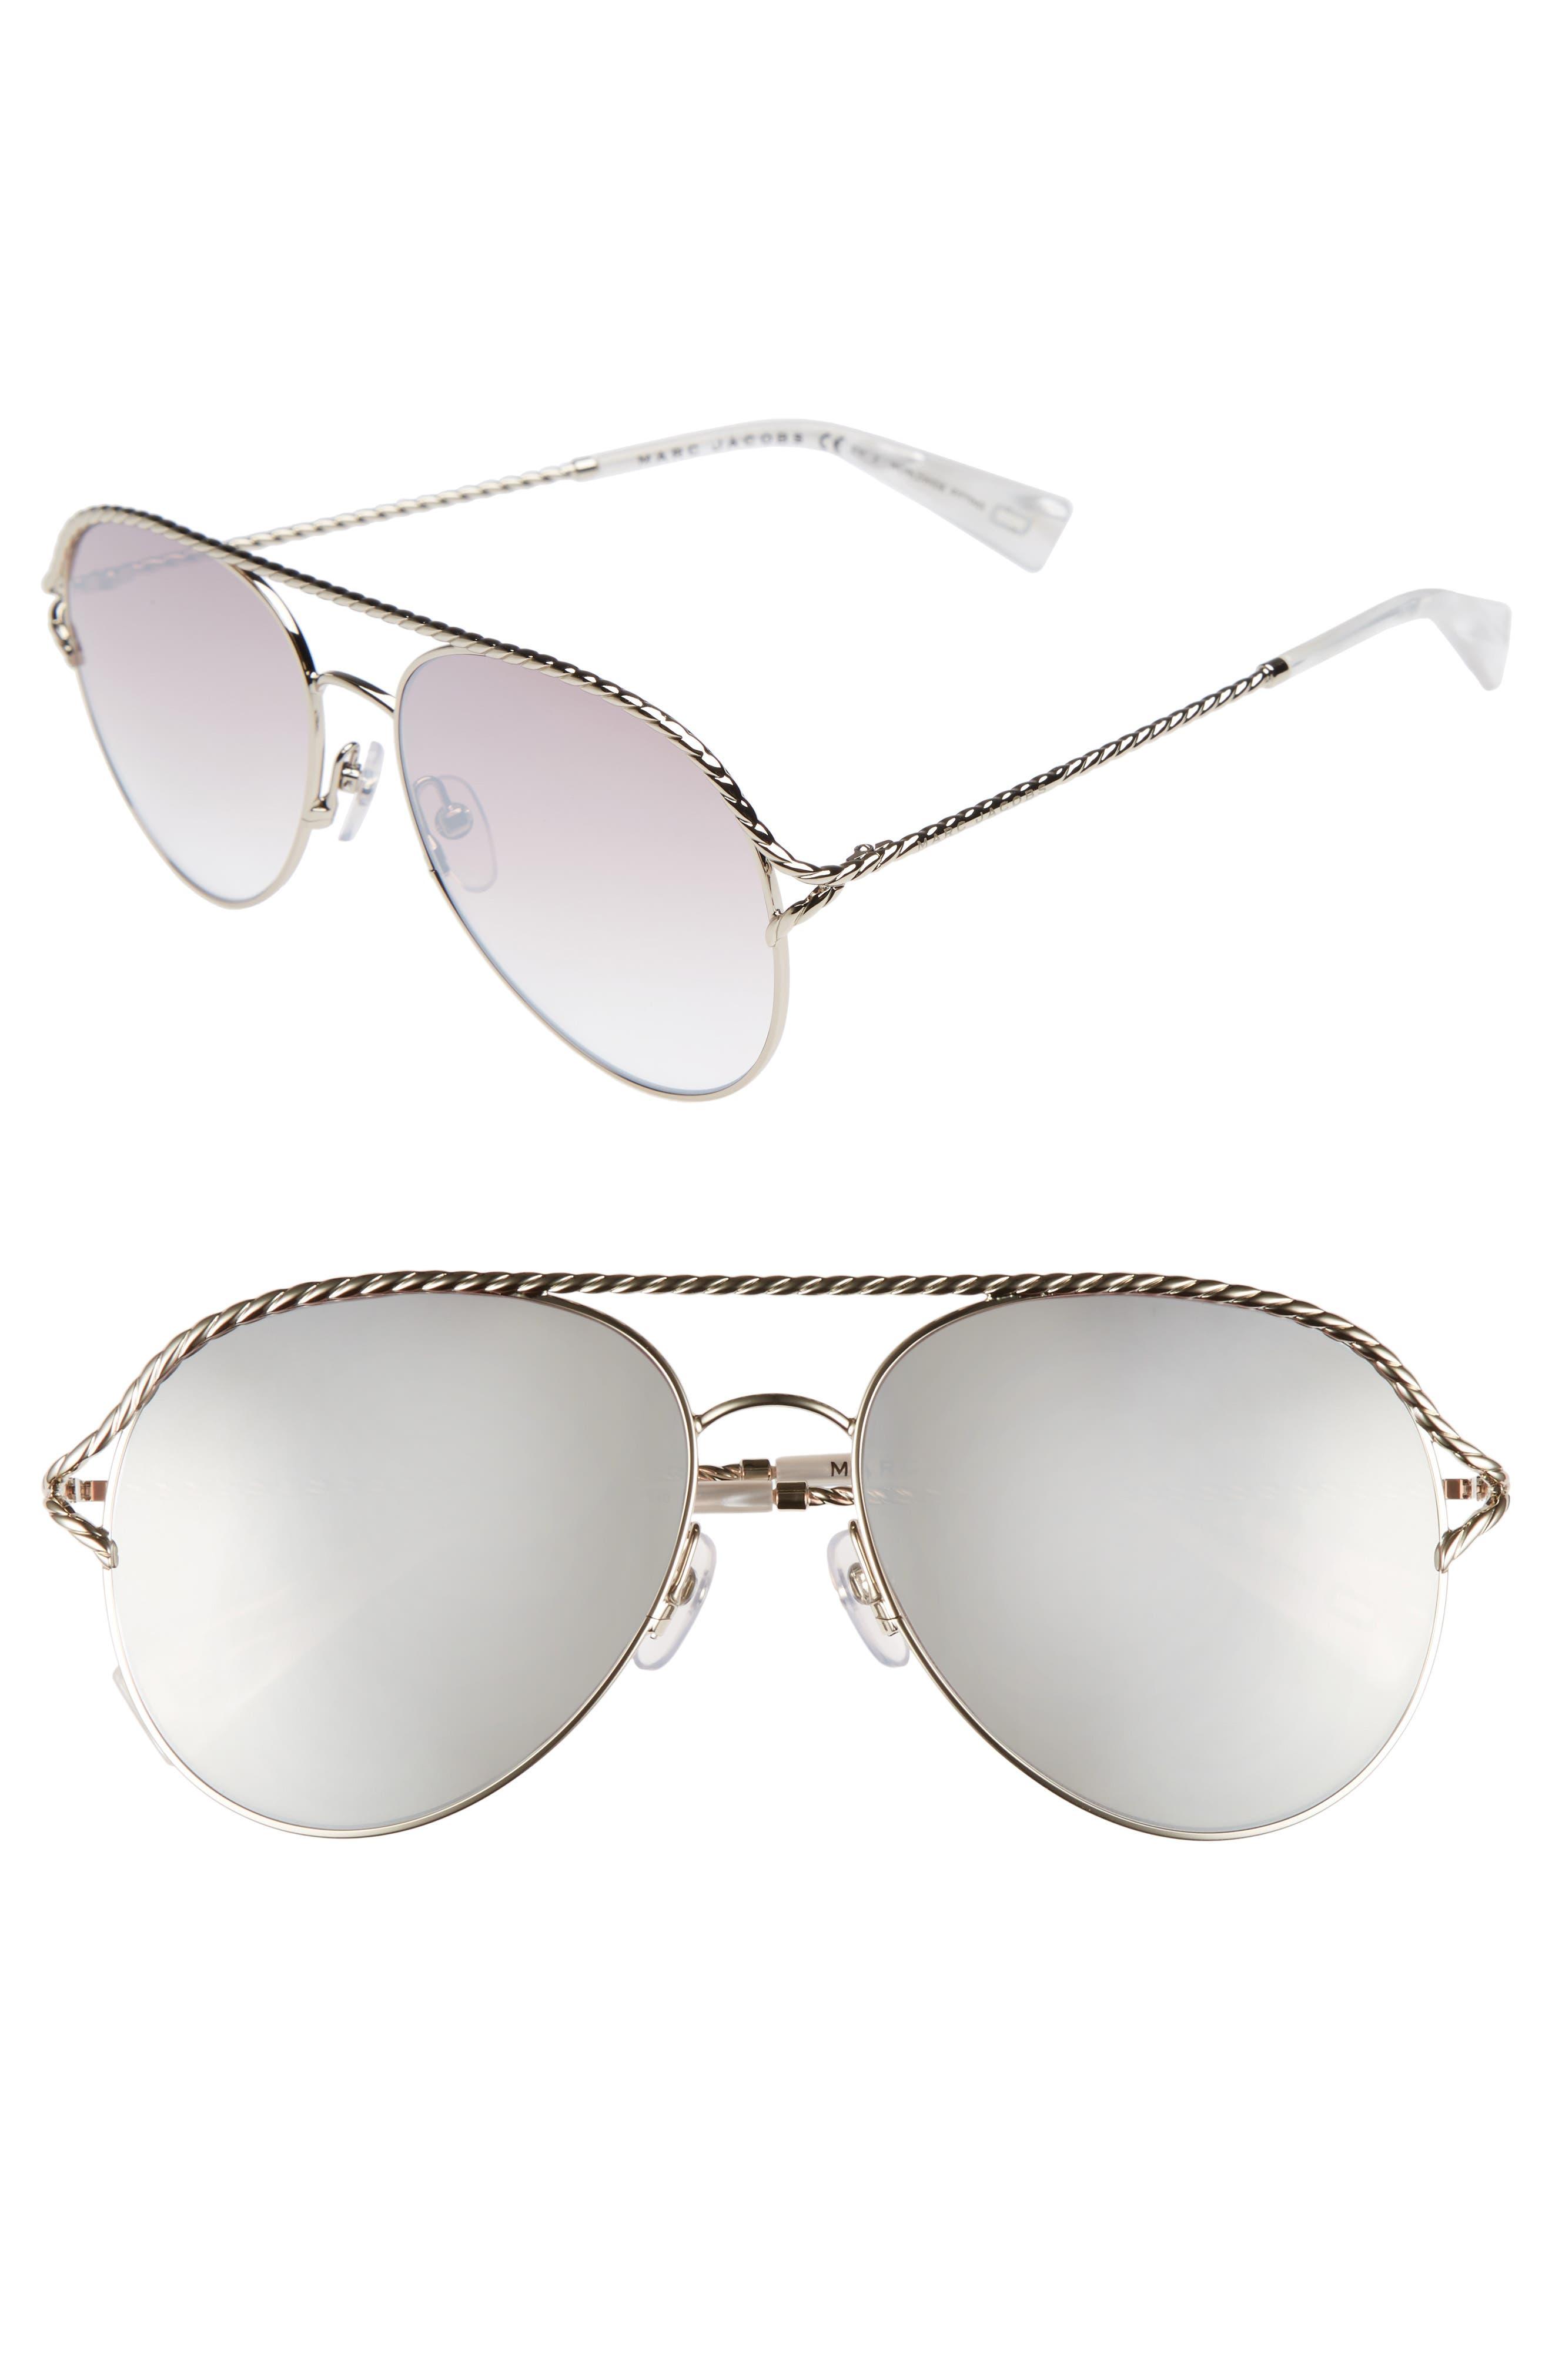 58mm Aviator Sunglasses,                             Main thumbnail 1, color,                             100